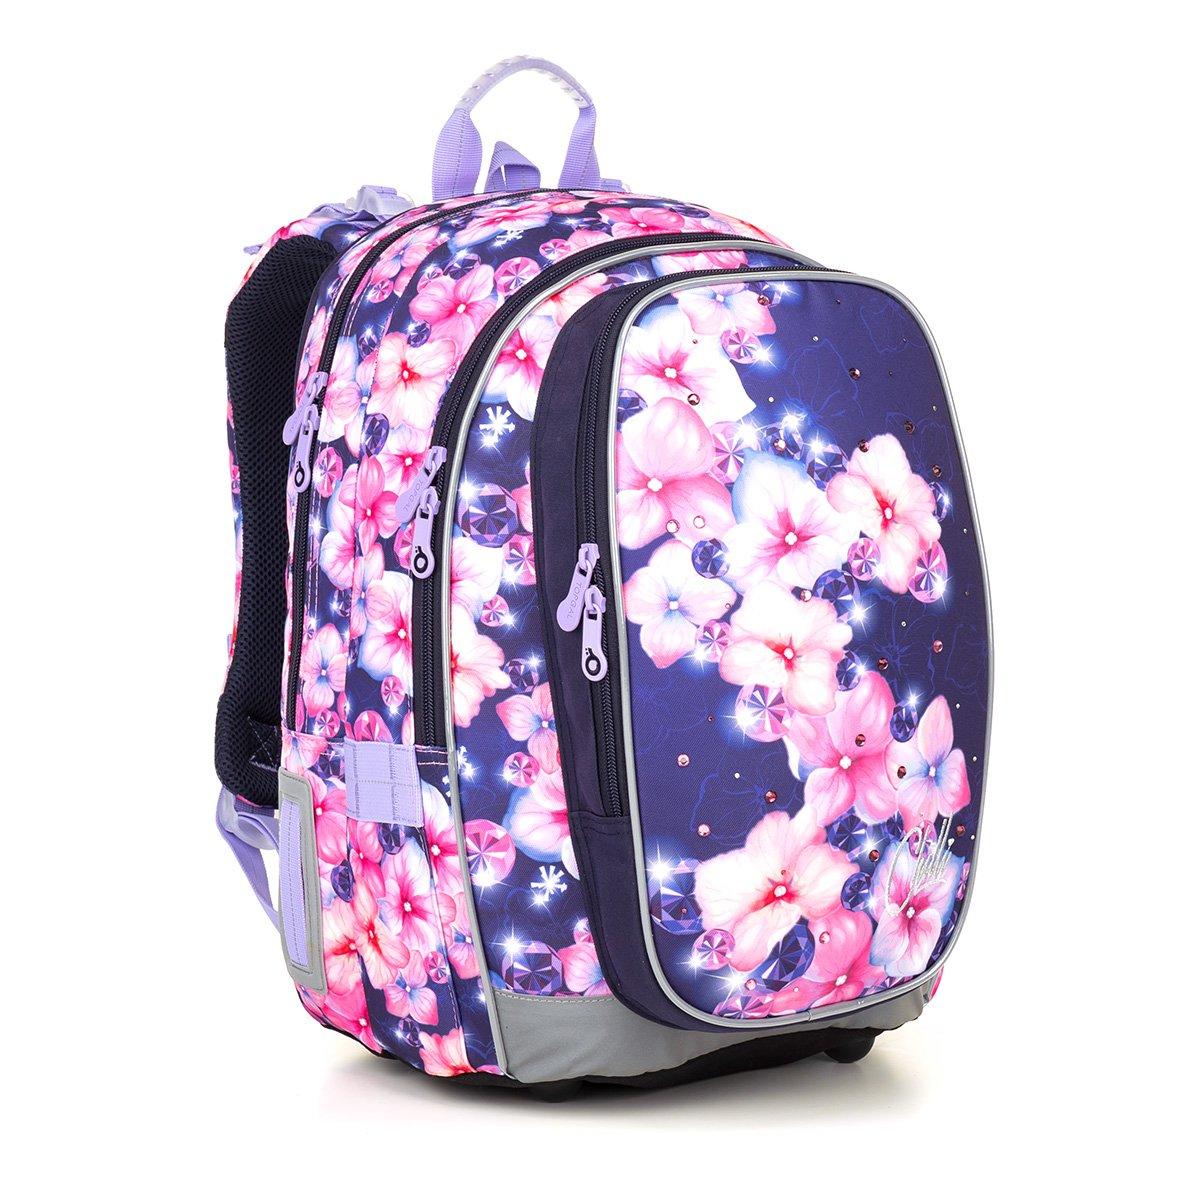 Školní batoh Topgal MIRA 18019 G 0003407474